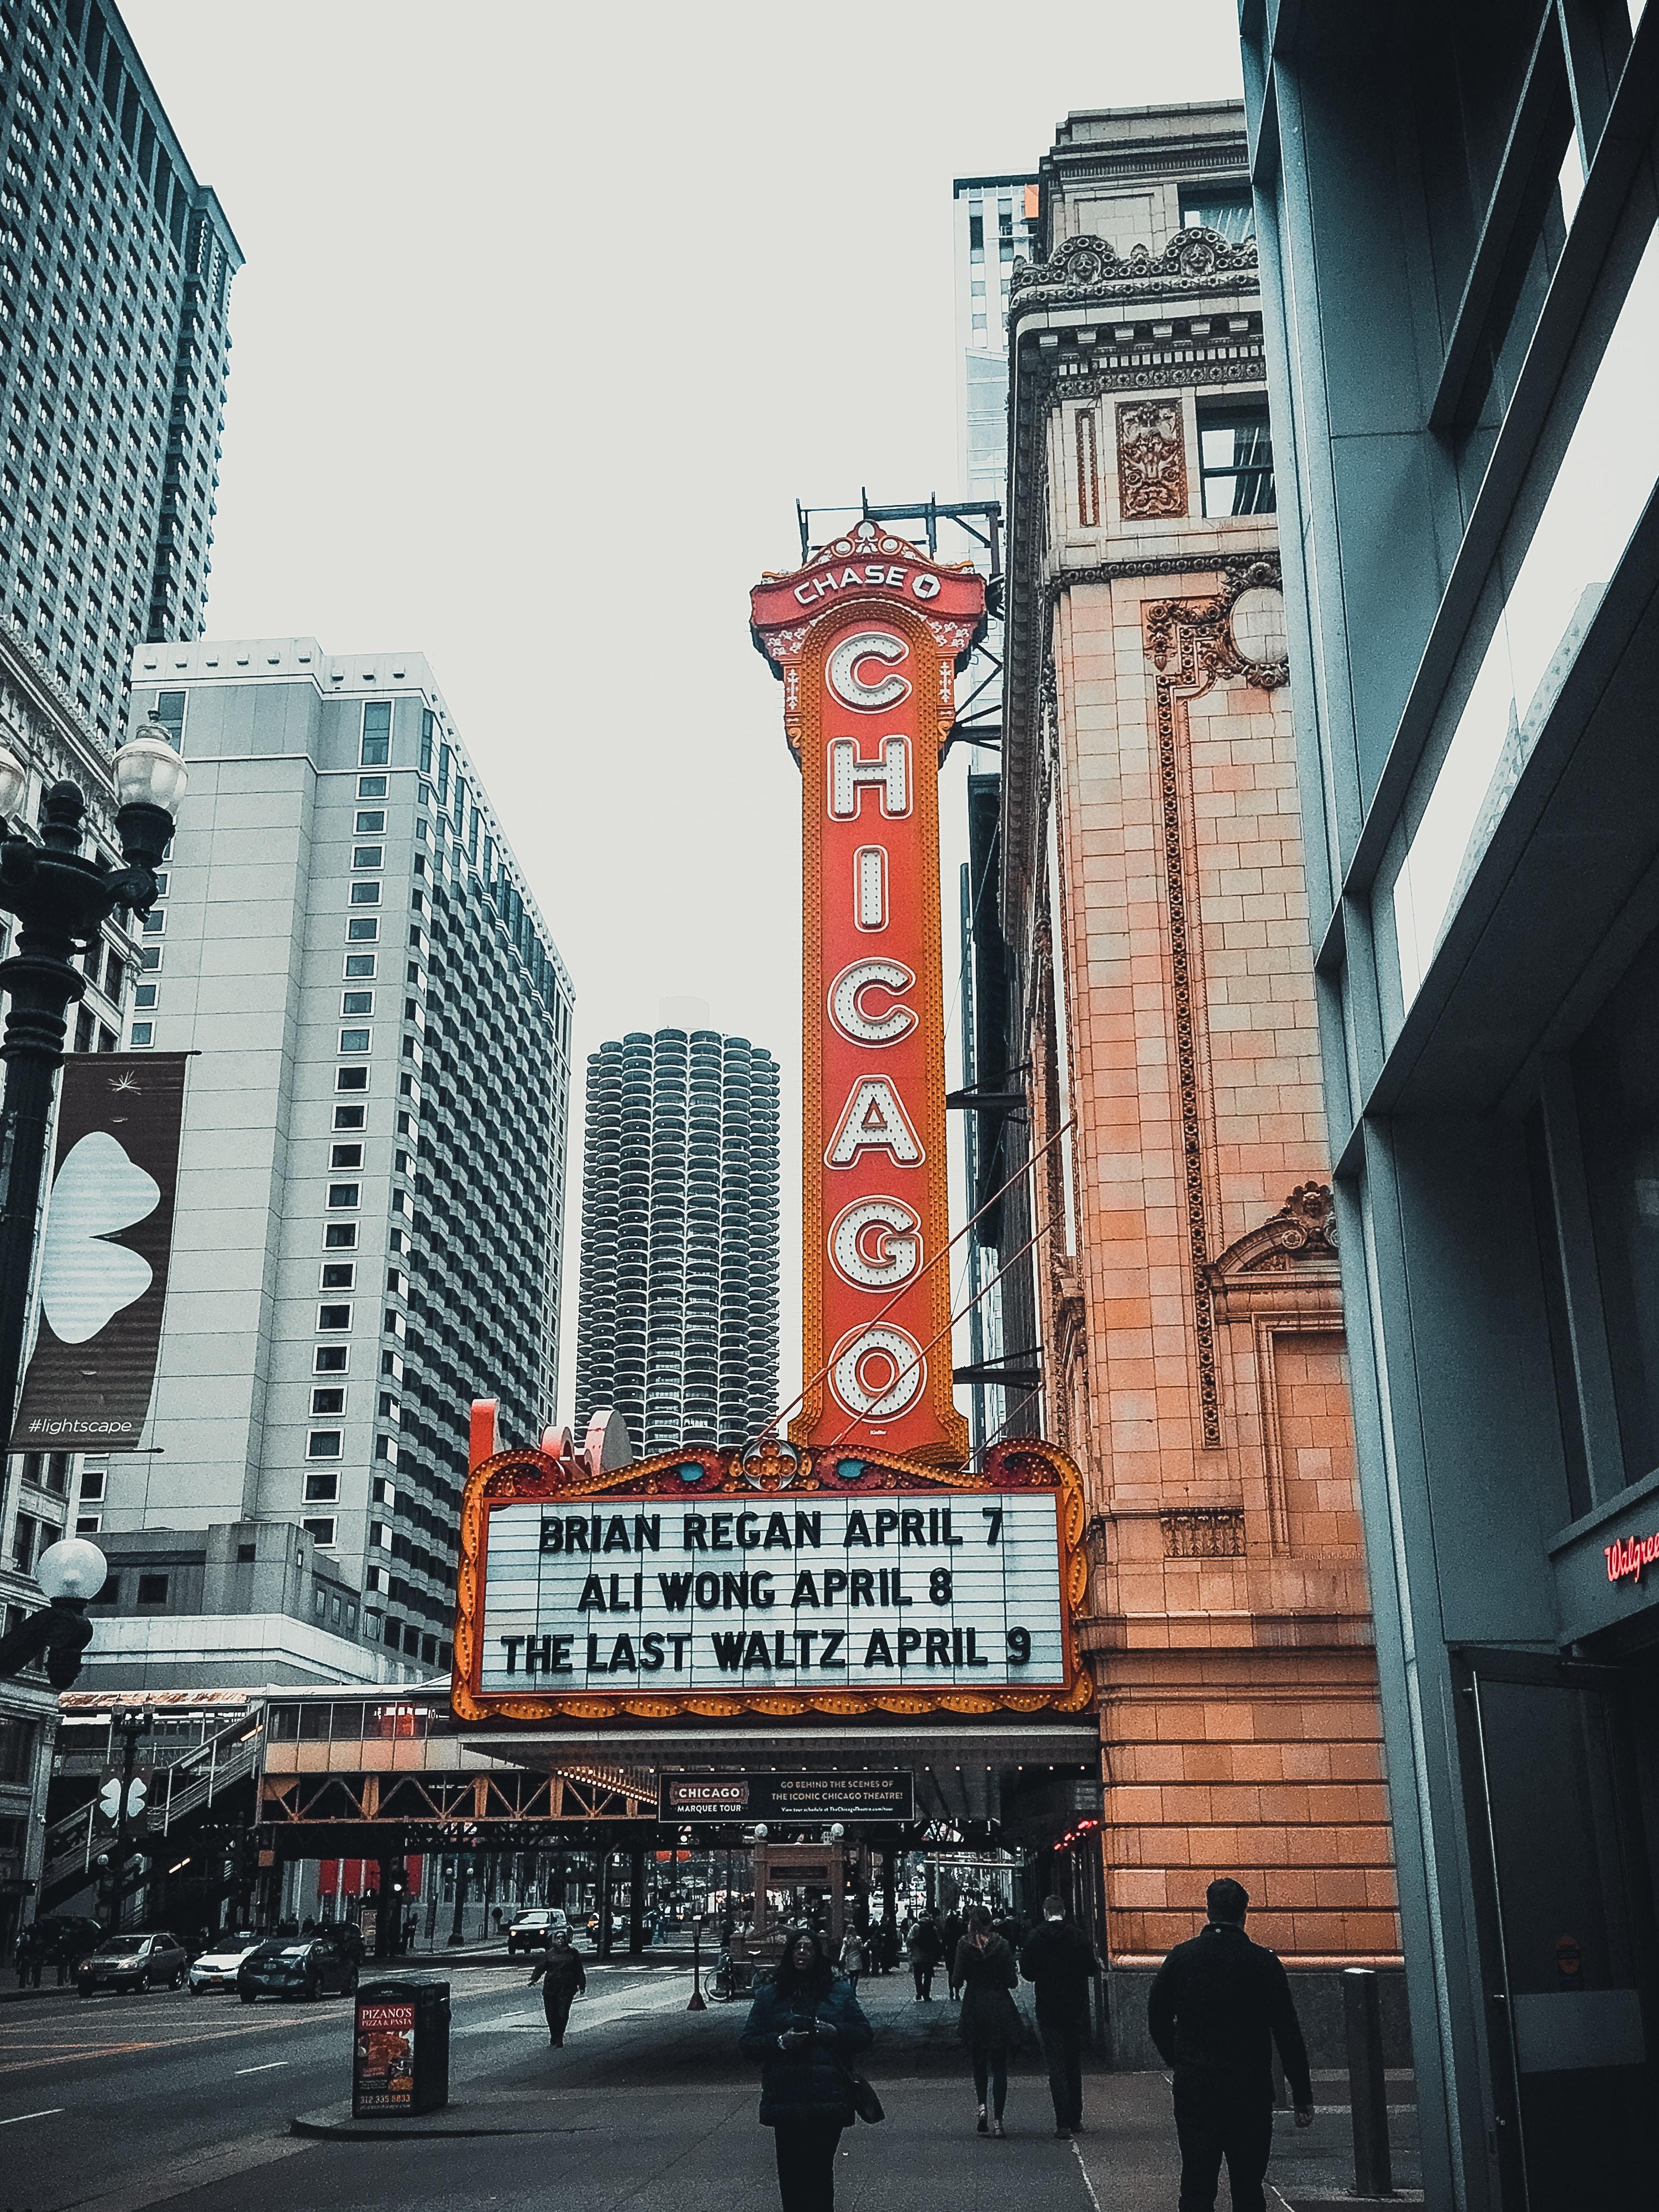 Chicago theater showing Brain Regan on April 7